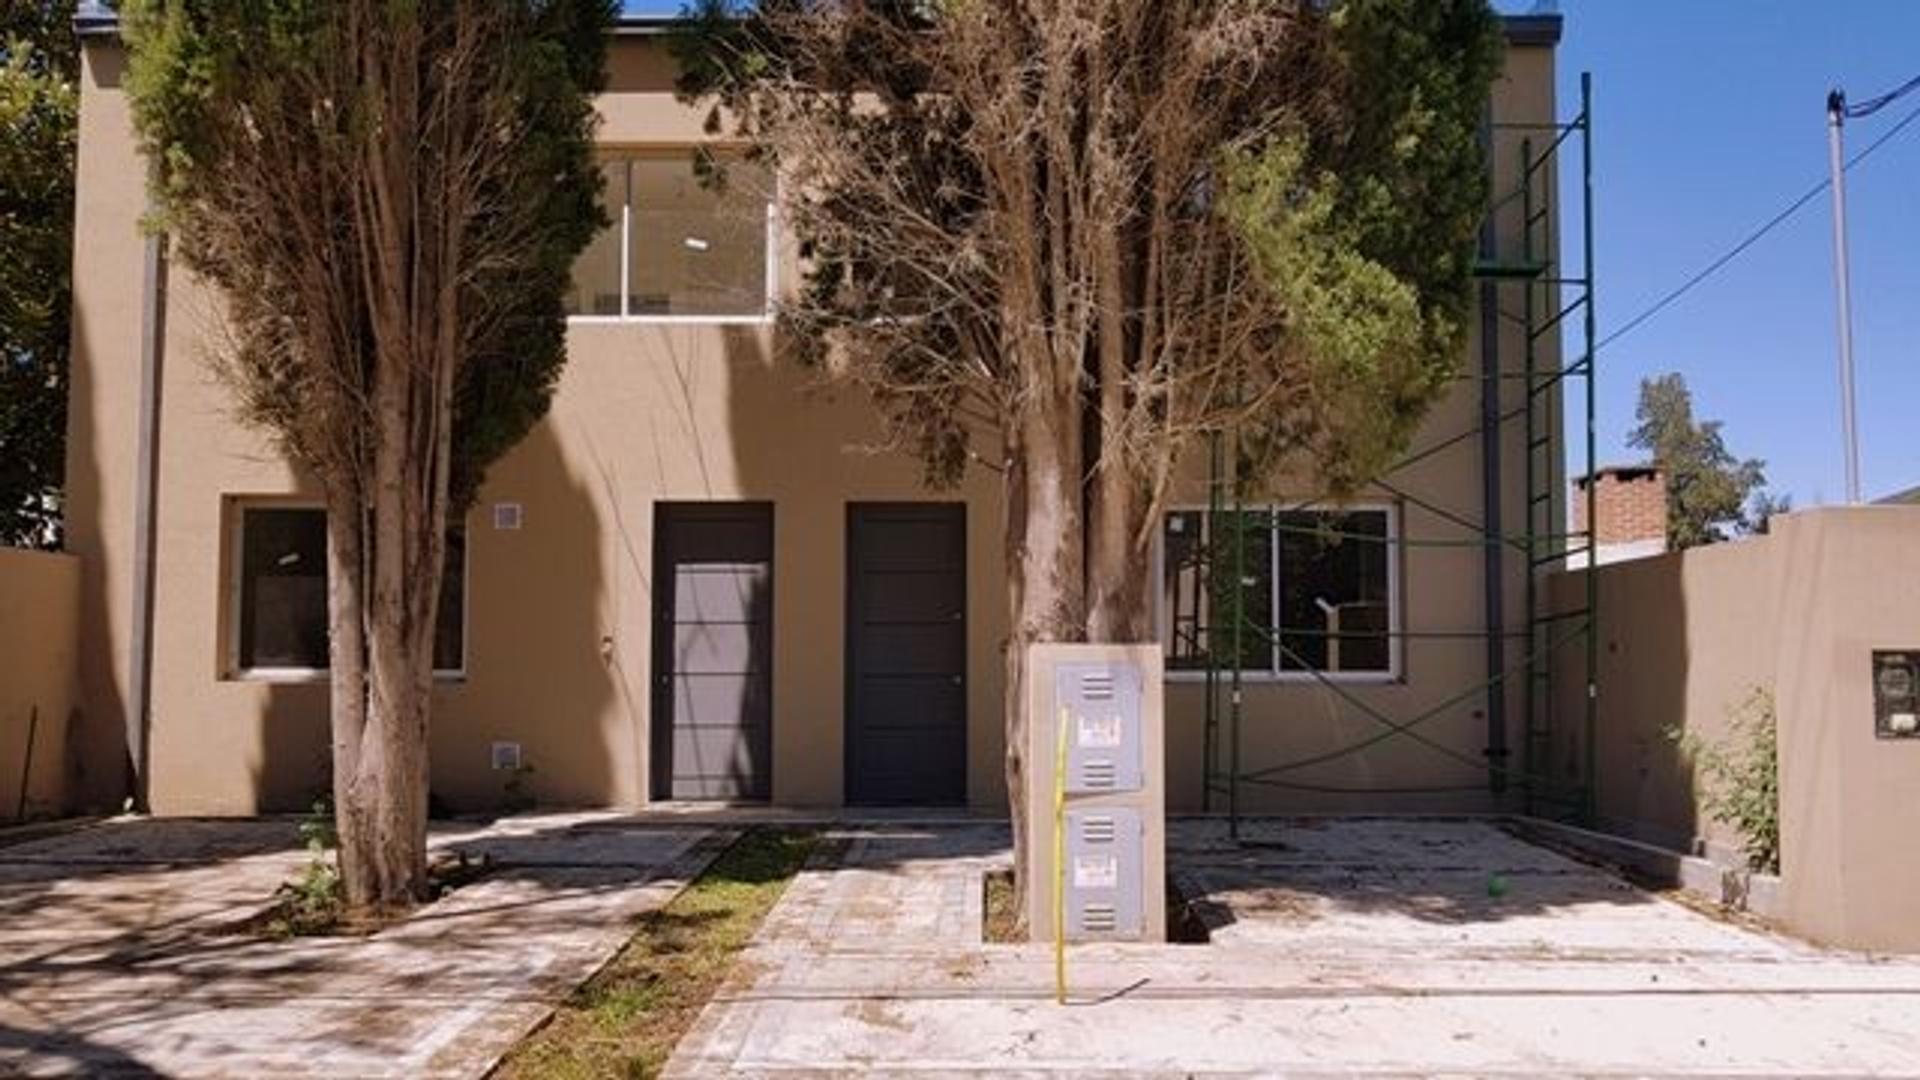 XINTEL(GZI-GZ1-523) Casa - Venta - Argentina, Pilar - BRAUN 1271